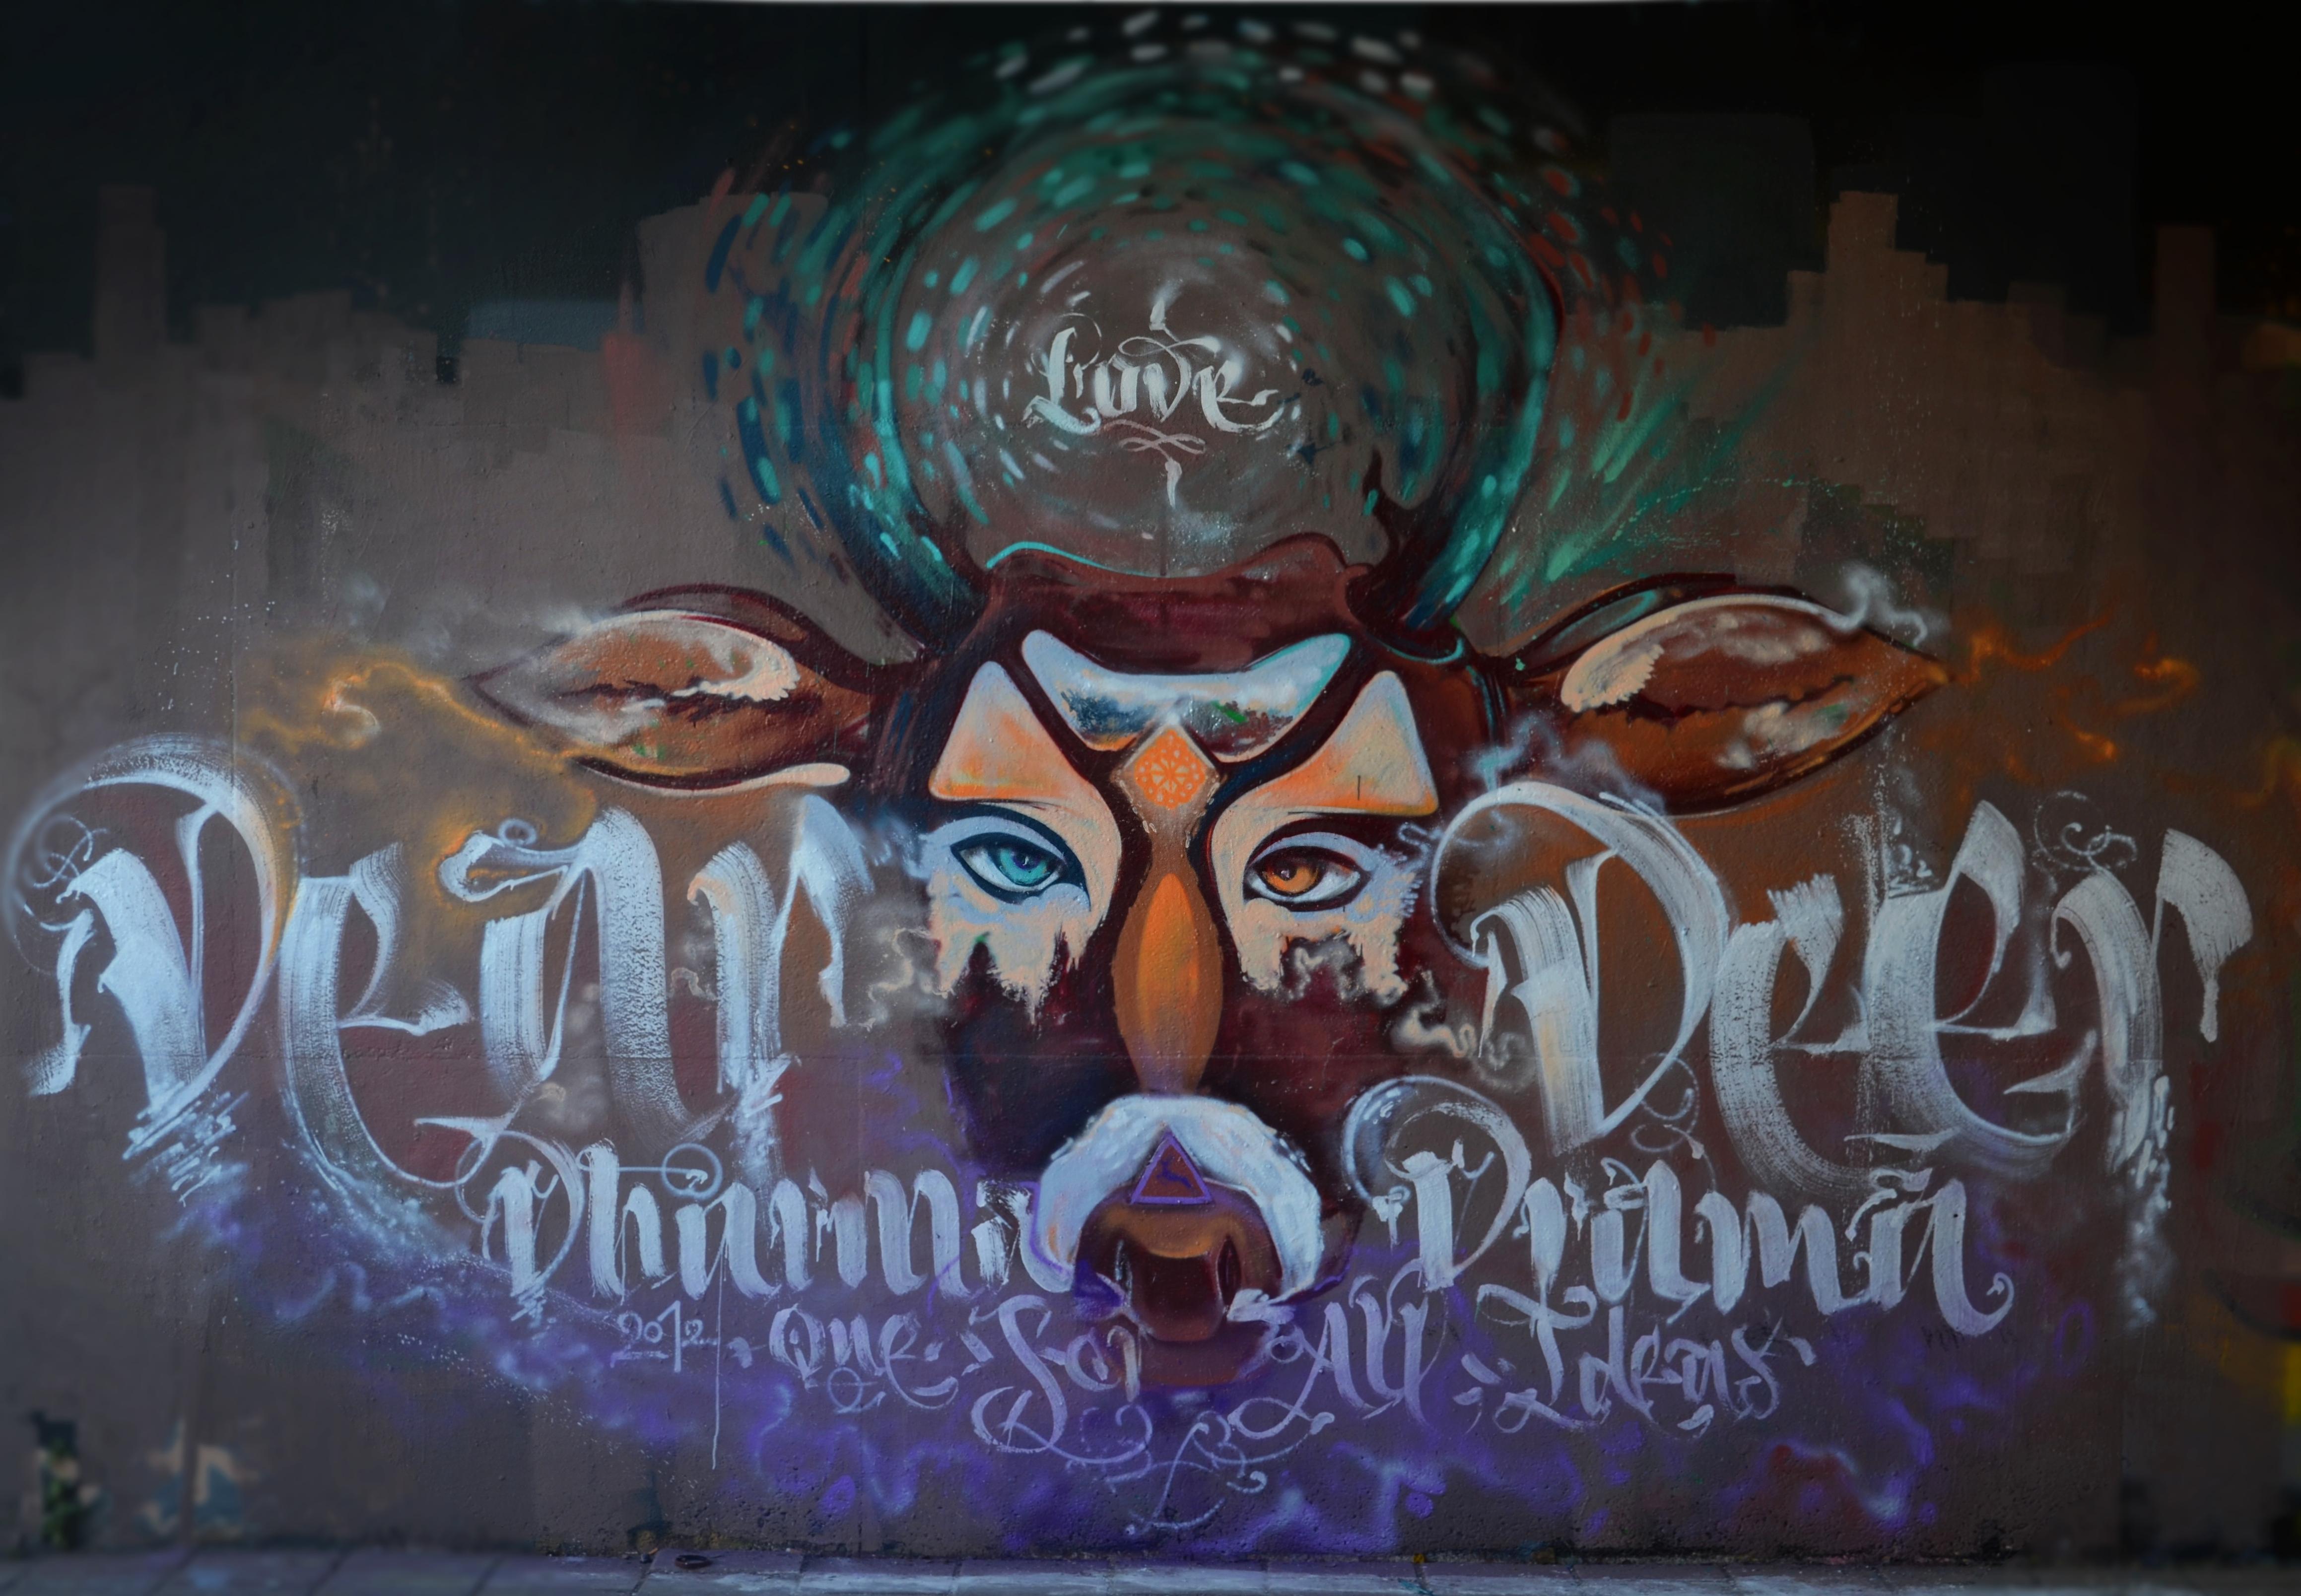 DearDEER_denhaag12